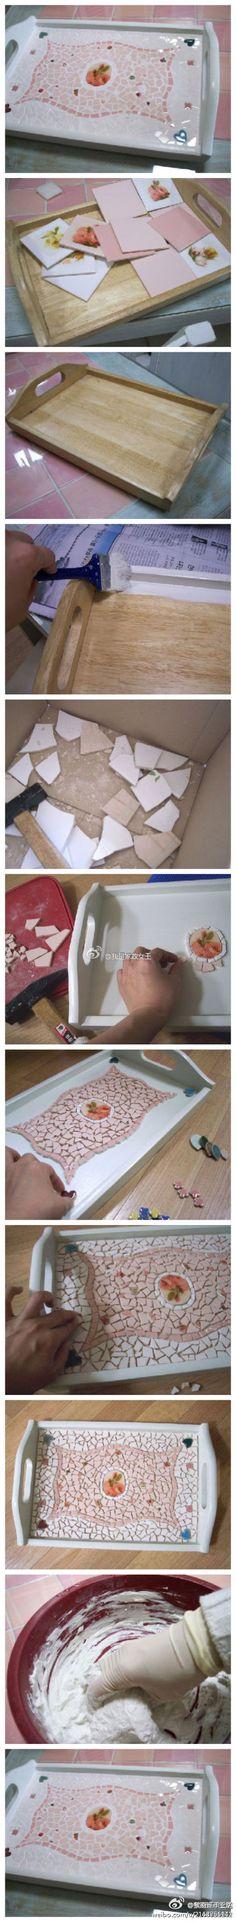 Mosaic tile tray tutorial